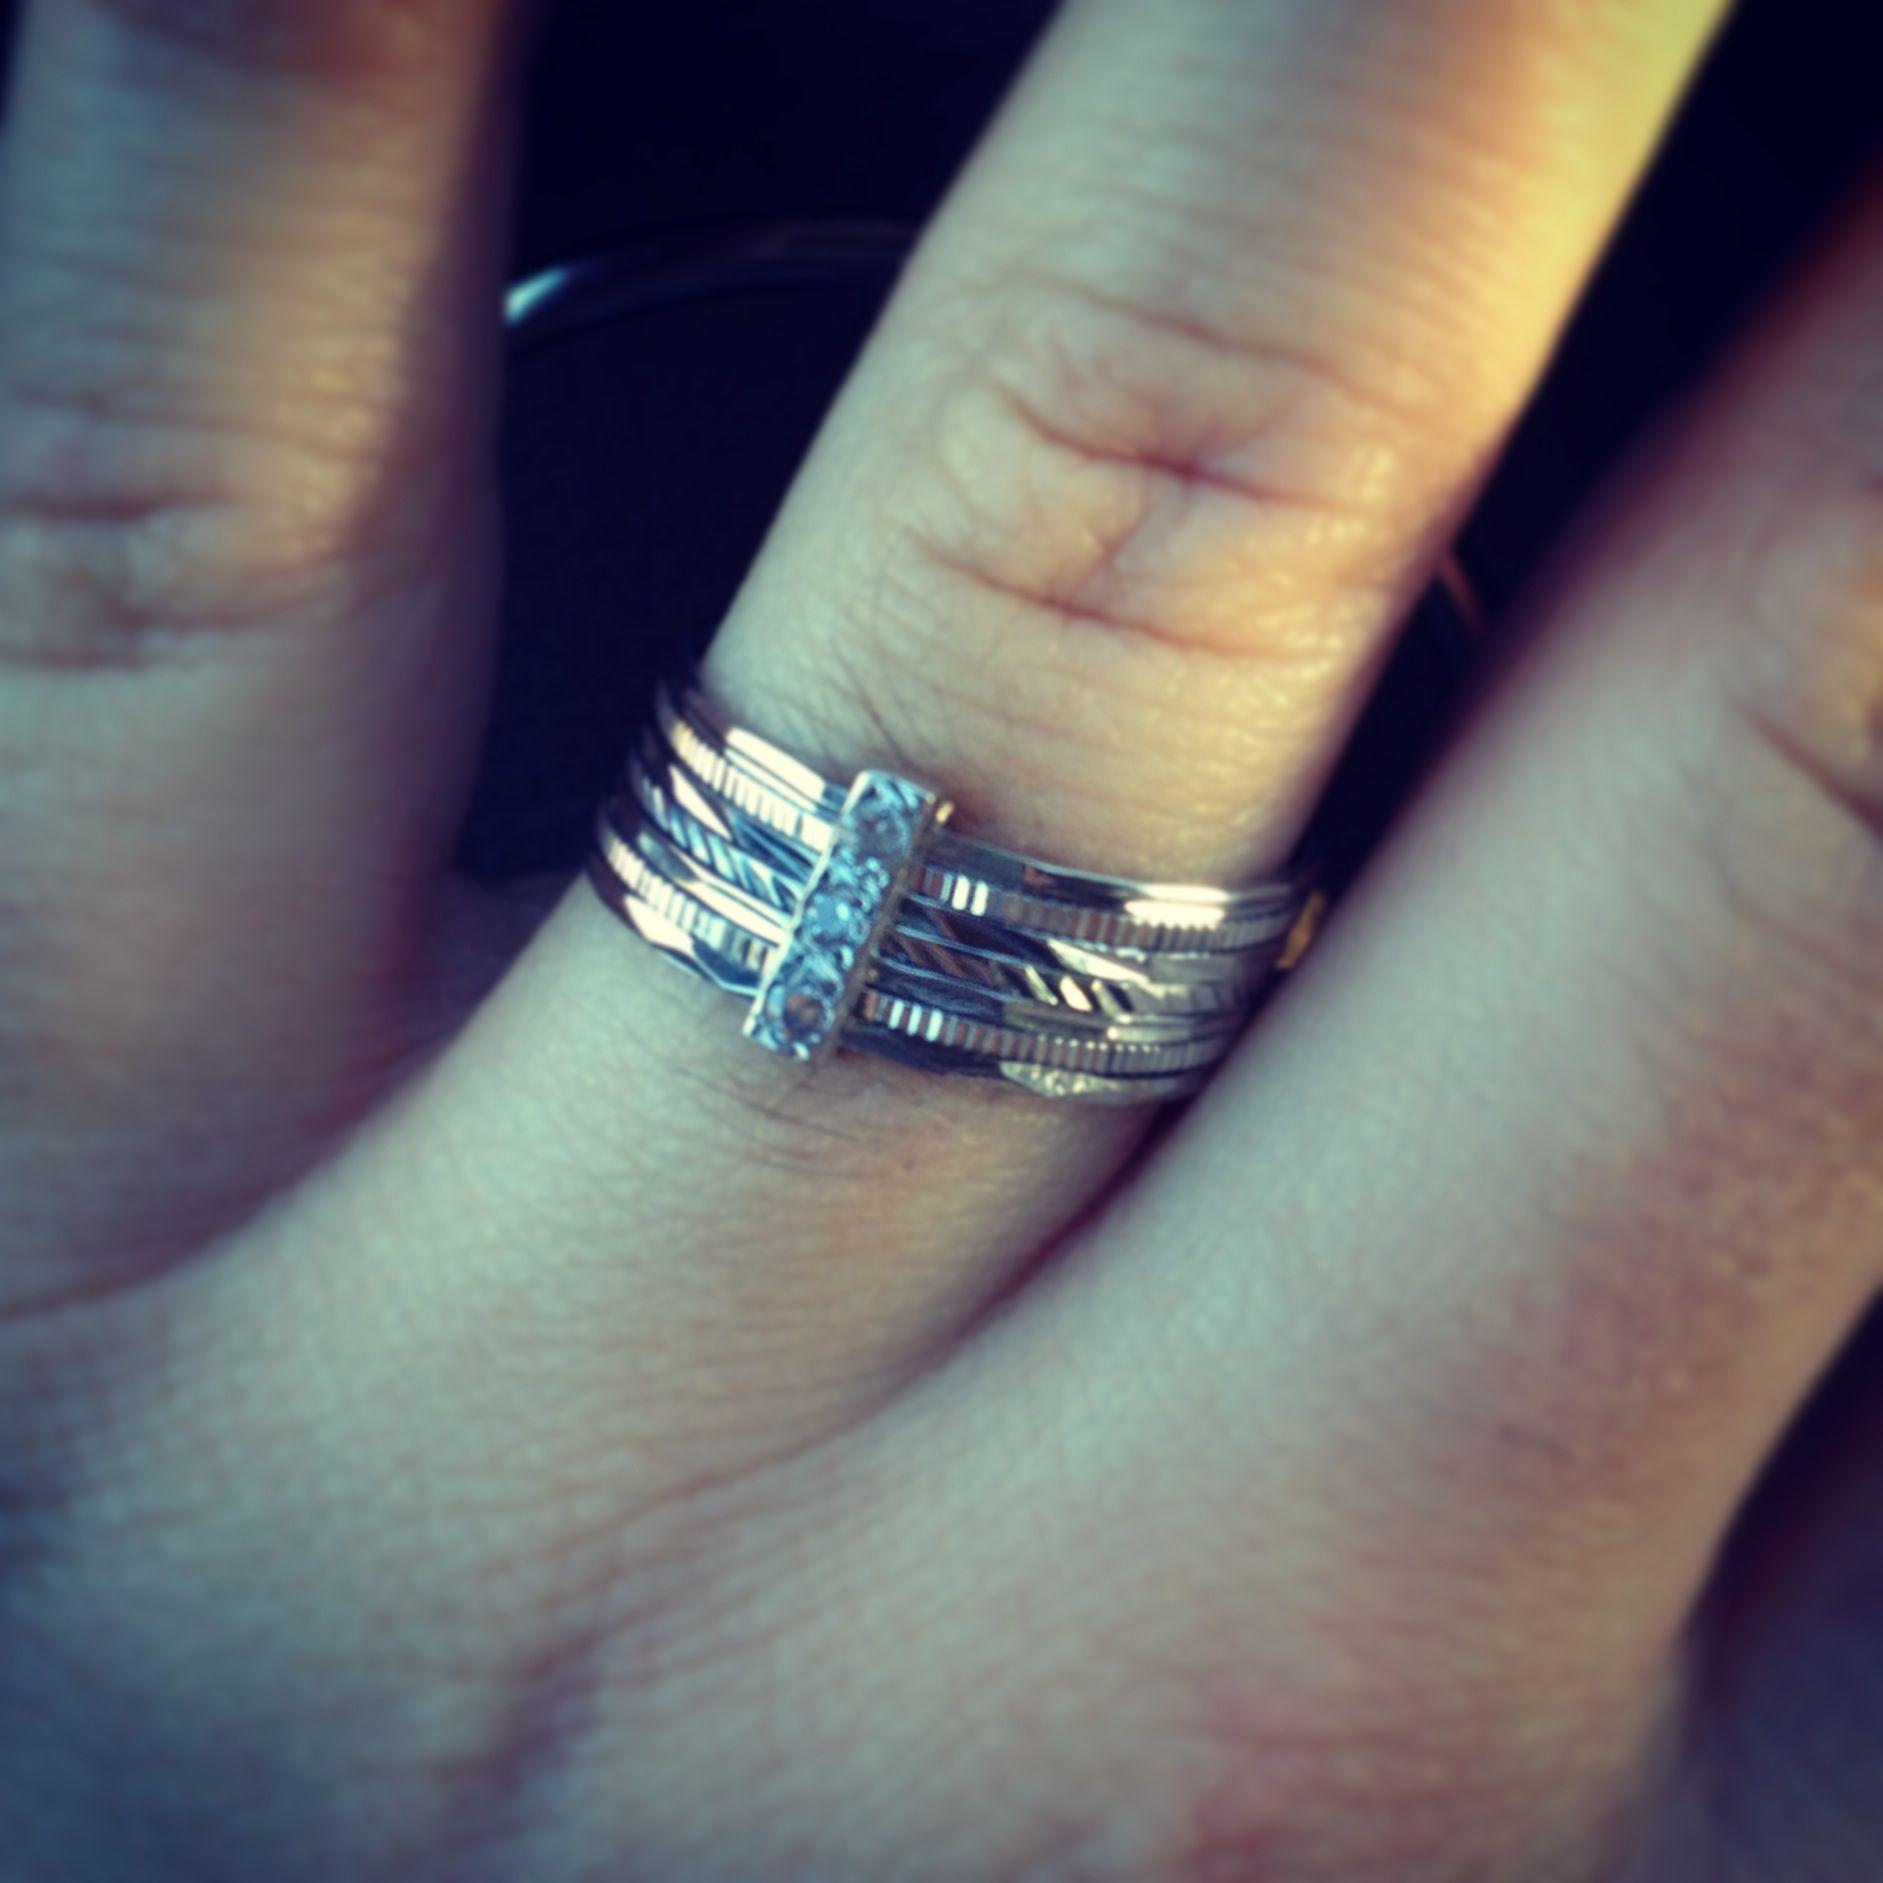 I LoVe My Beautiful Portuguese Ring